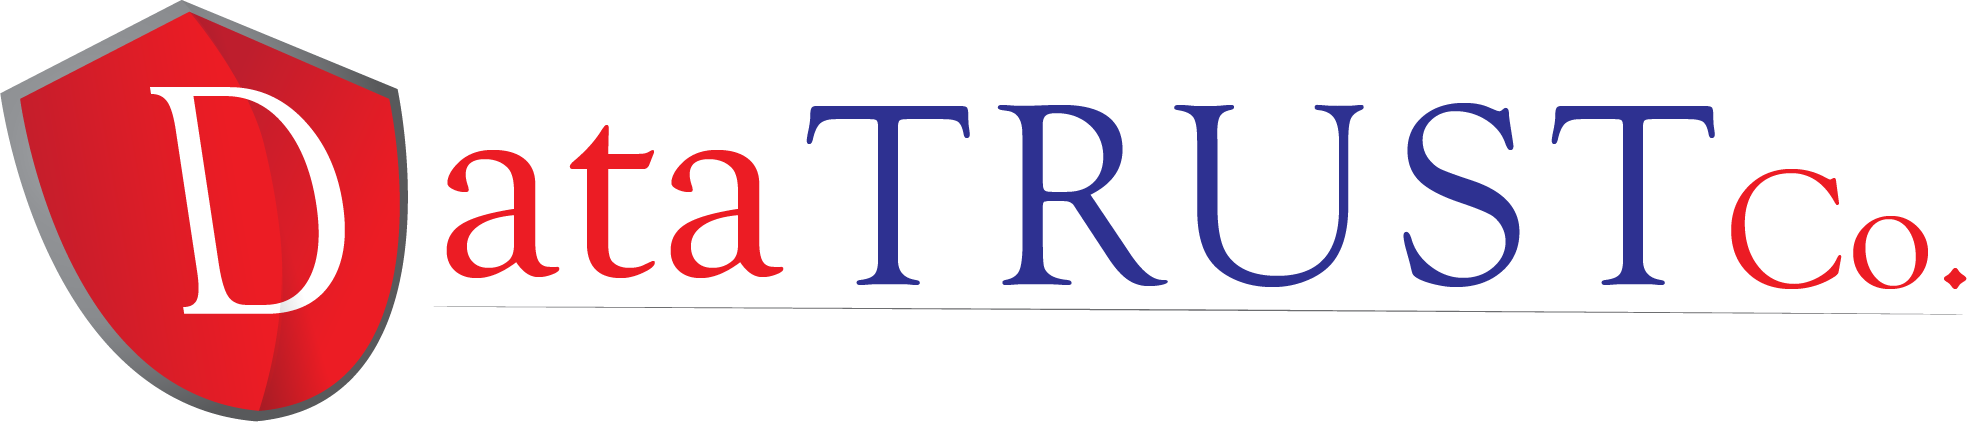 Data Trust Co